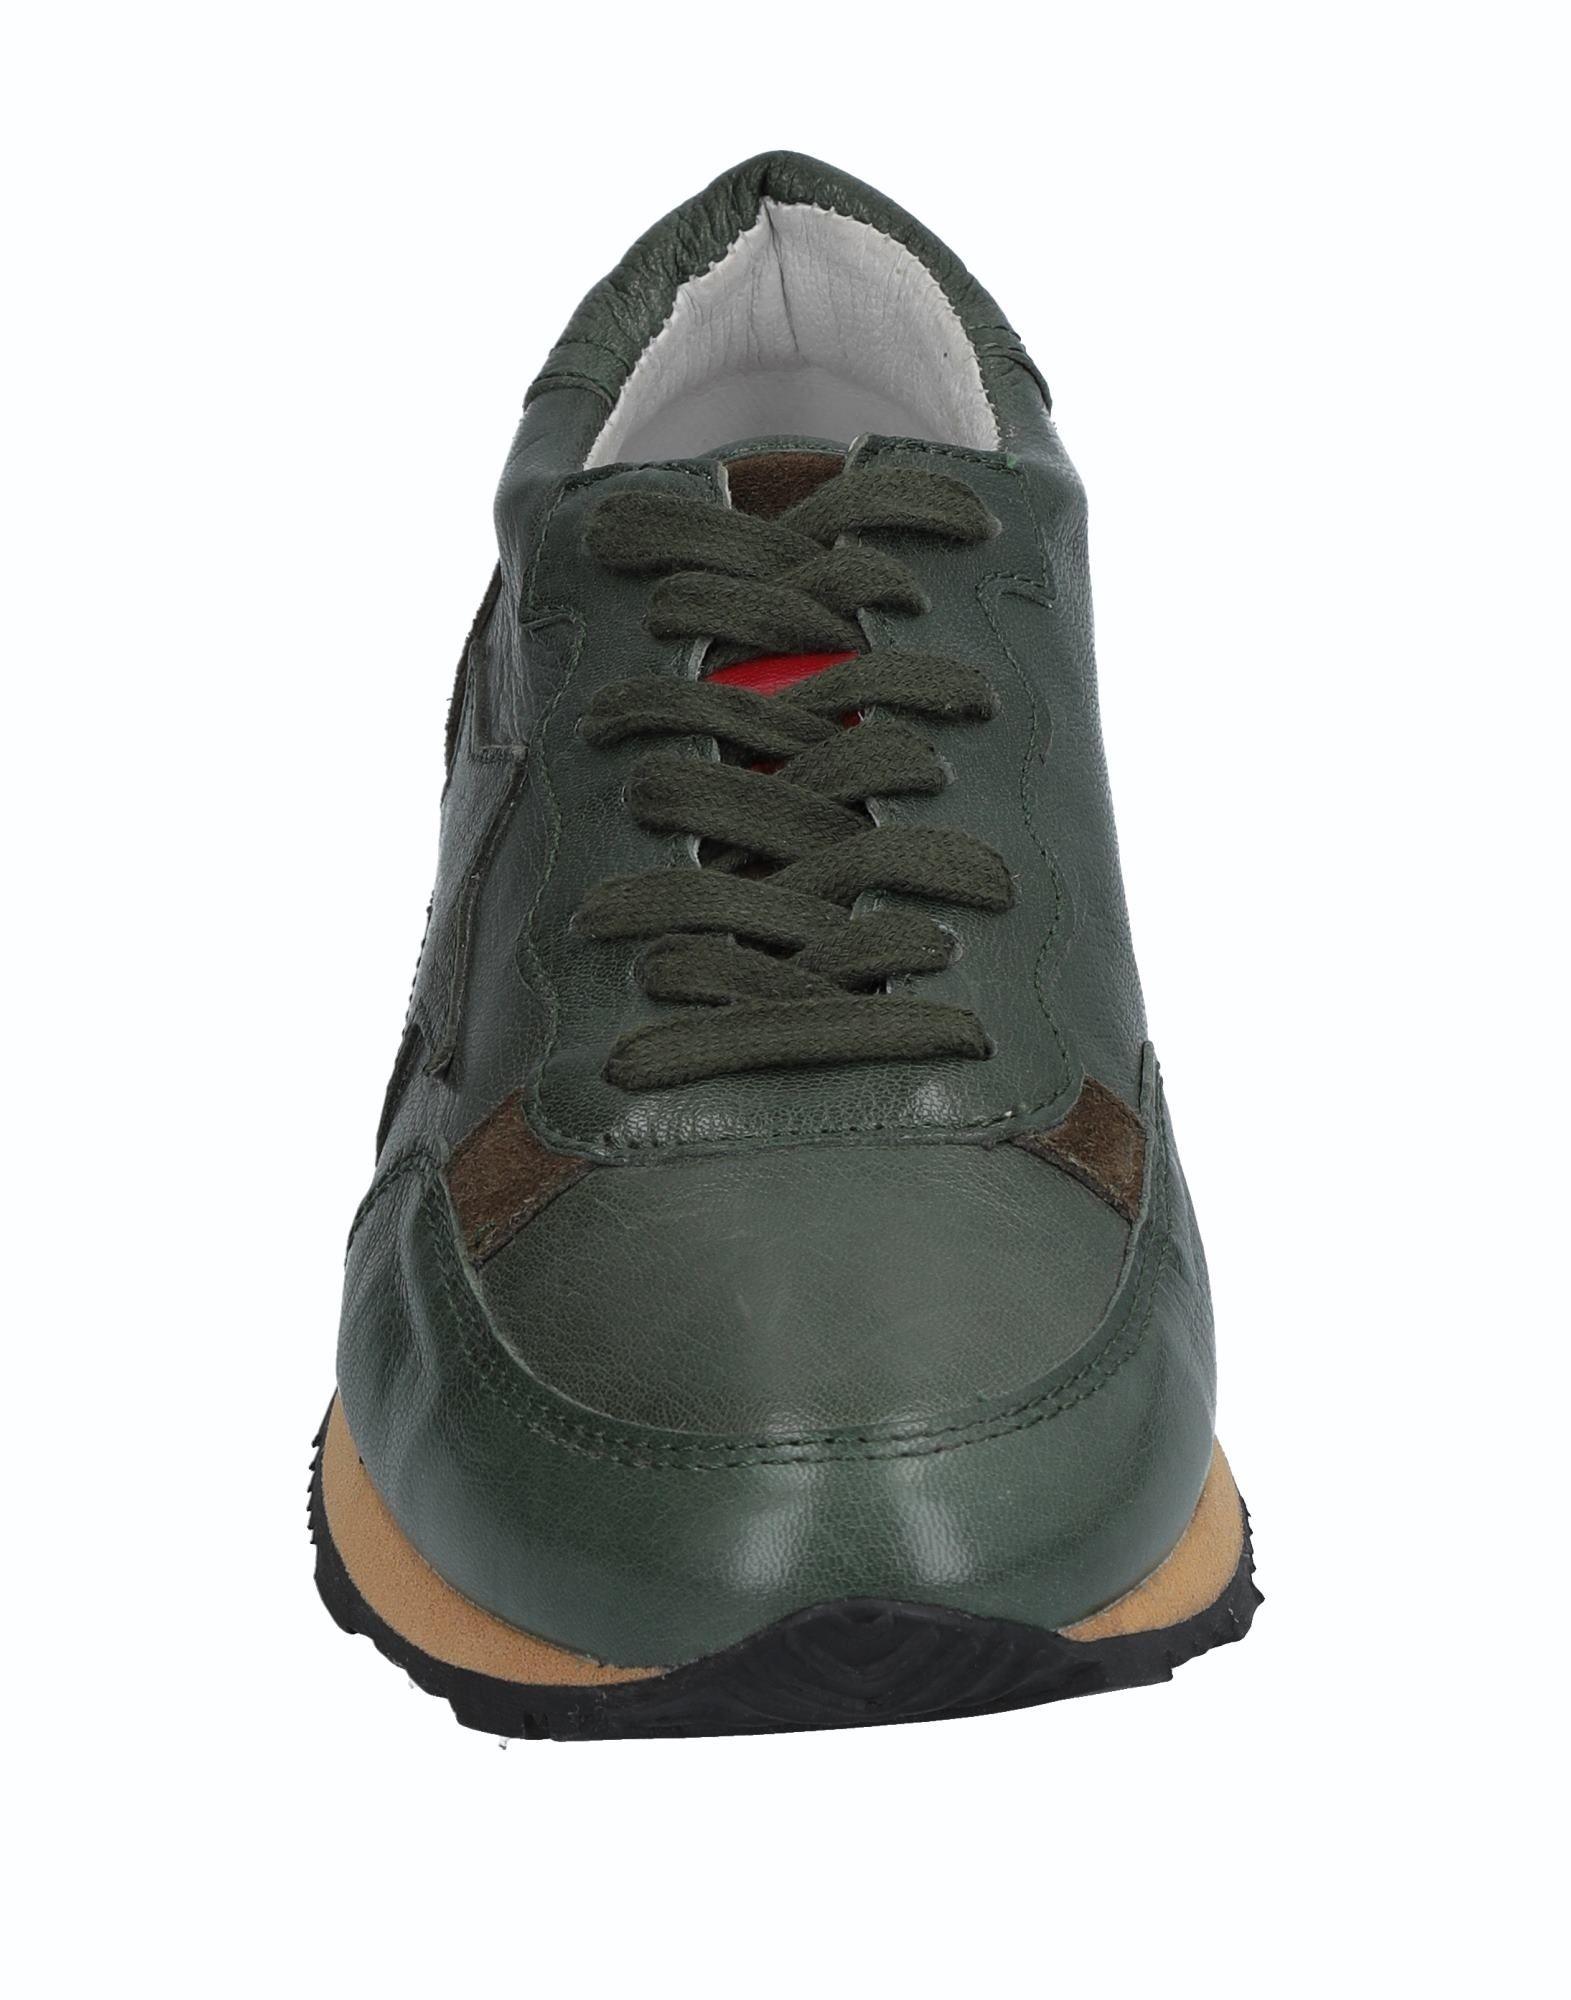 Ishikawa Sneakers - Women Ishikawa Ishikawa Ishikawa Sneakers online on  Canada - 11523616PN 5edd86